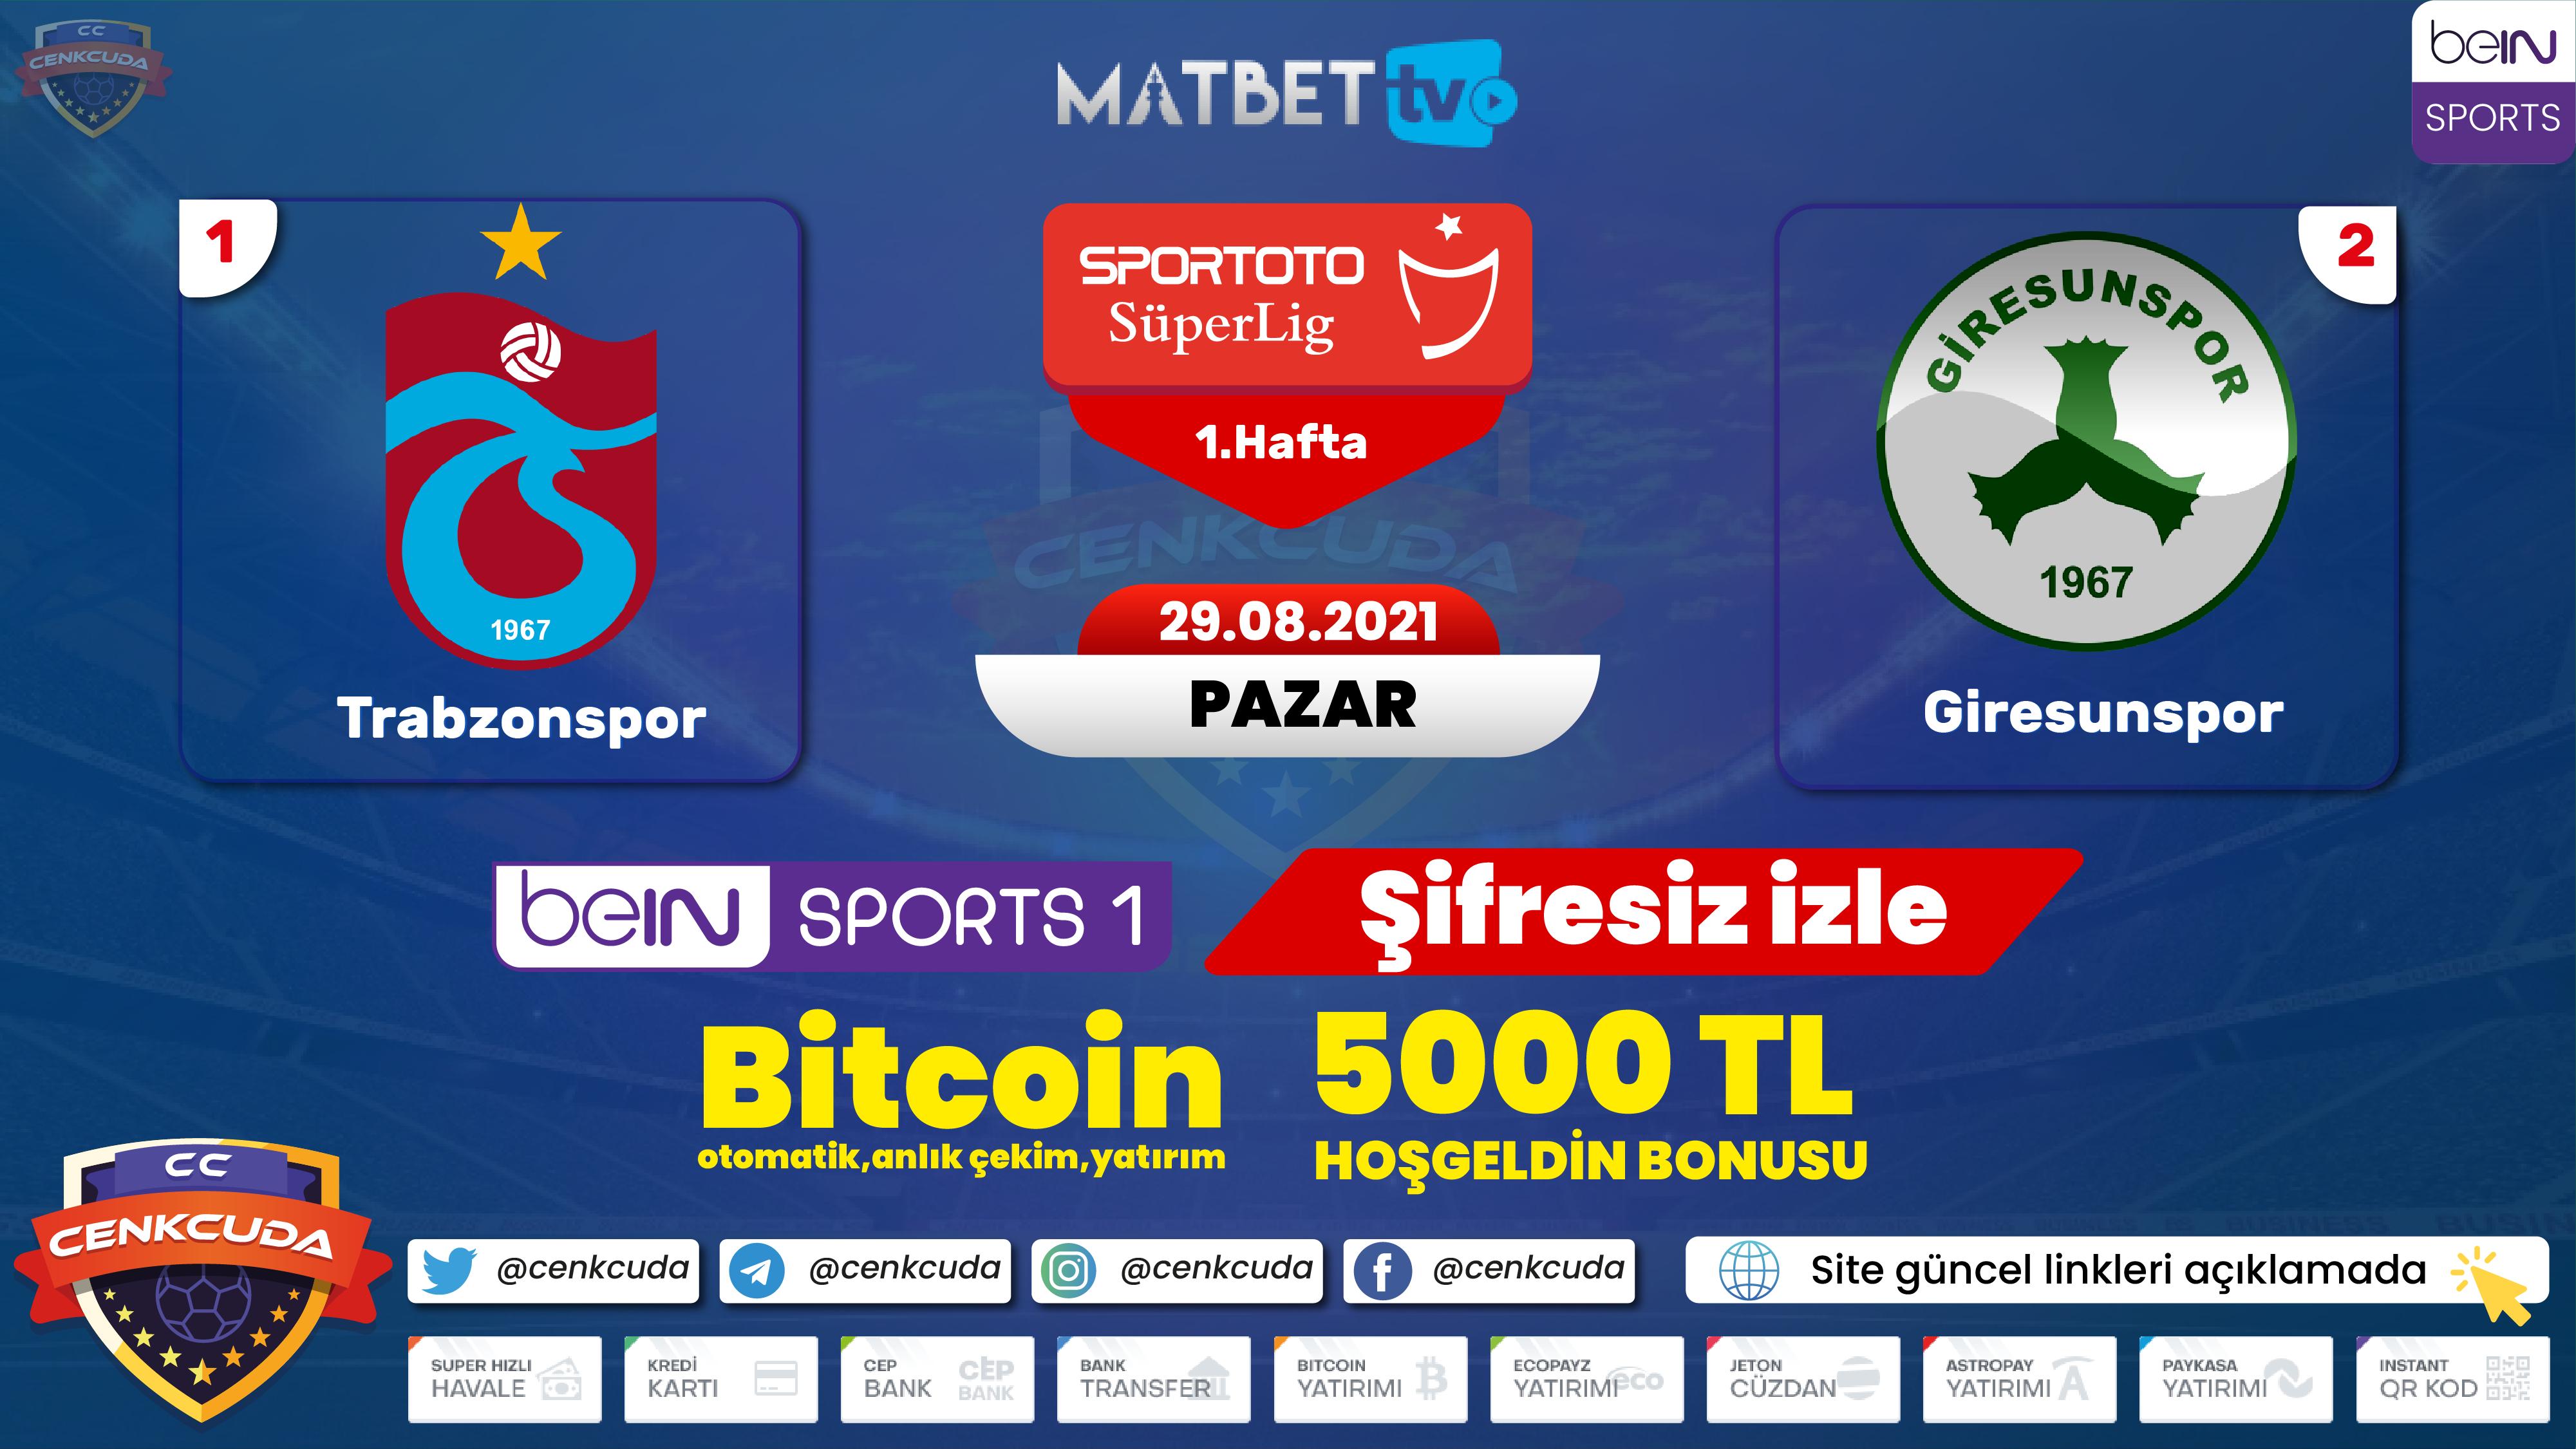 Giresunspor Trabzonspor